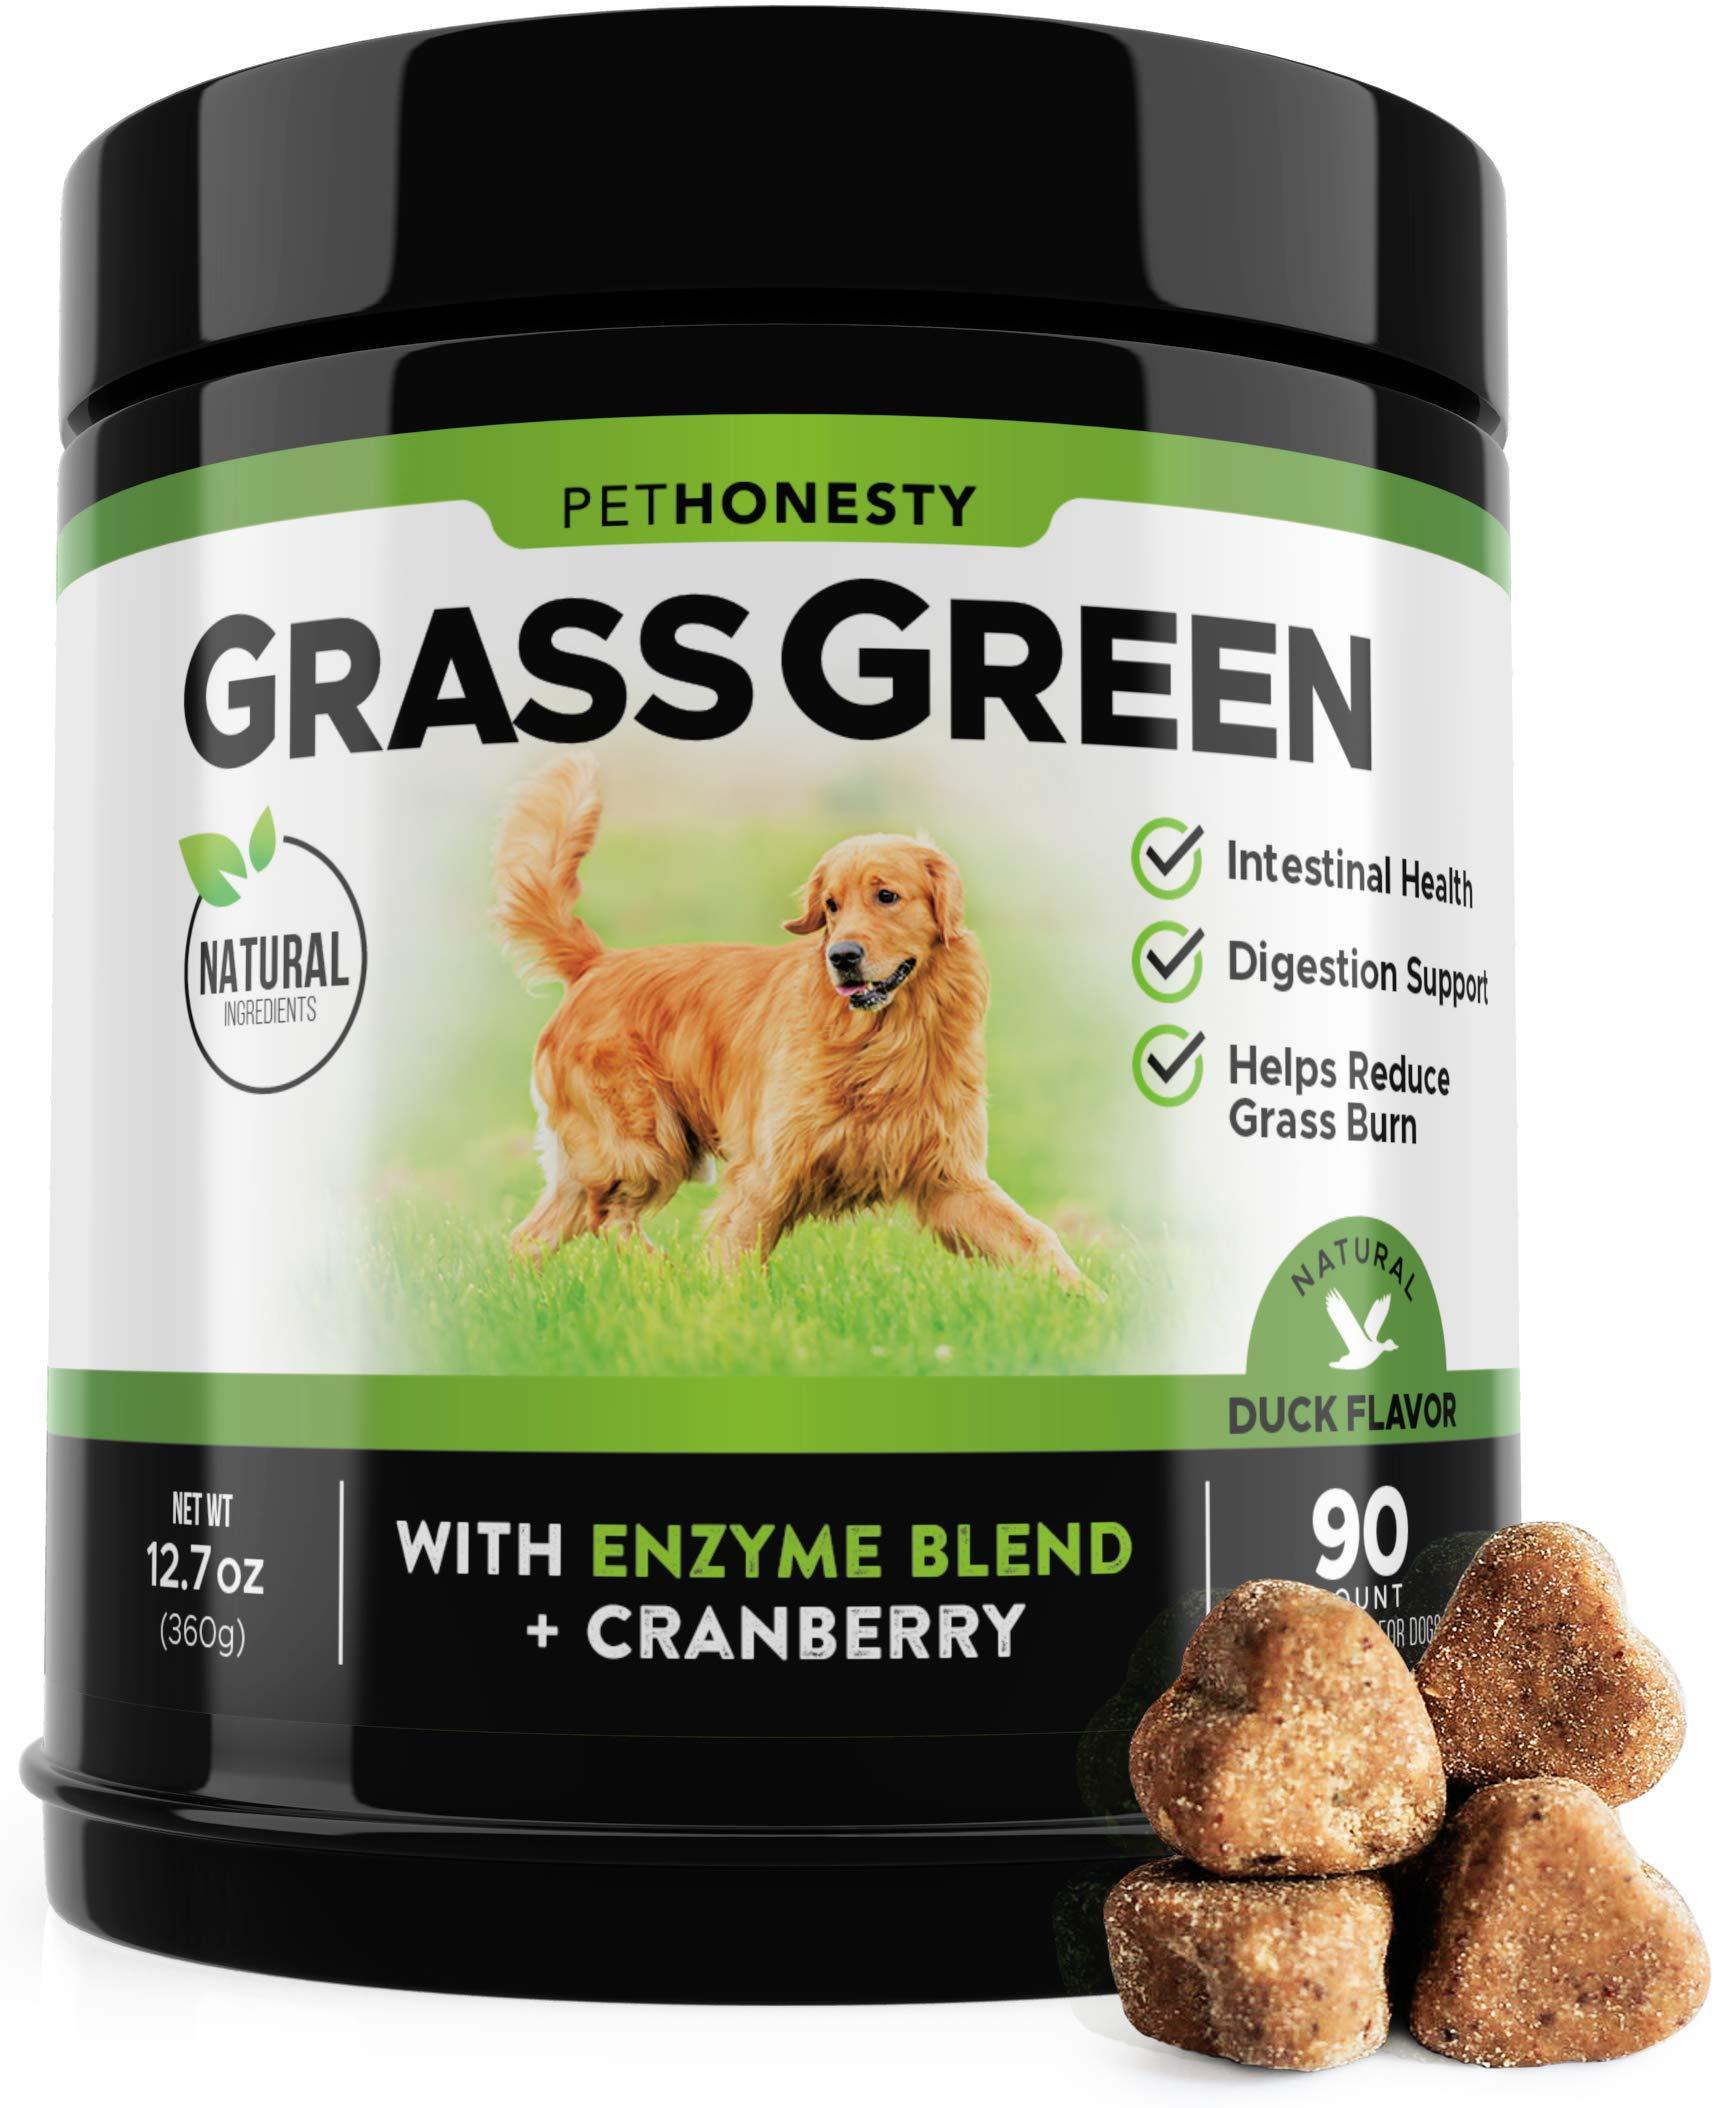 PetHonesty GrassGreen Grass Burn Spot Chews for Dogs - Dog Pee Lawn Spot Saver Treatment Caused by Dog Urine - Cranberry, Apple Cider Vinegar, DL-Methionine Grass Treatment Rocks - 90 Chew Treats 1